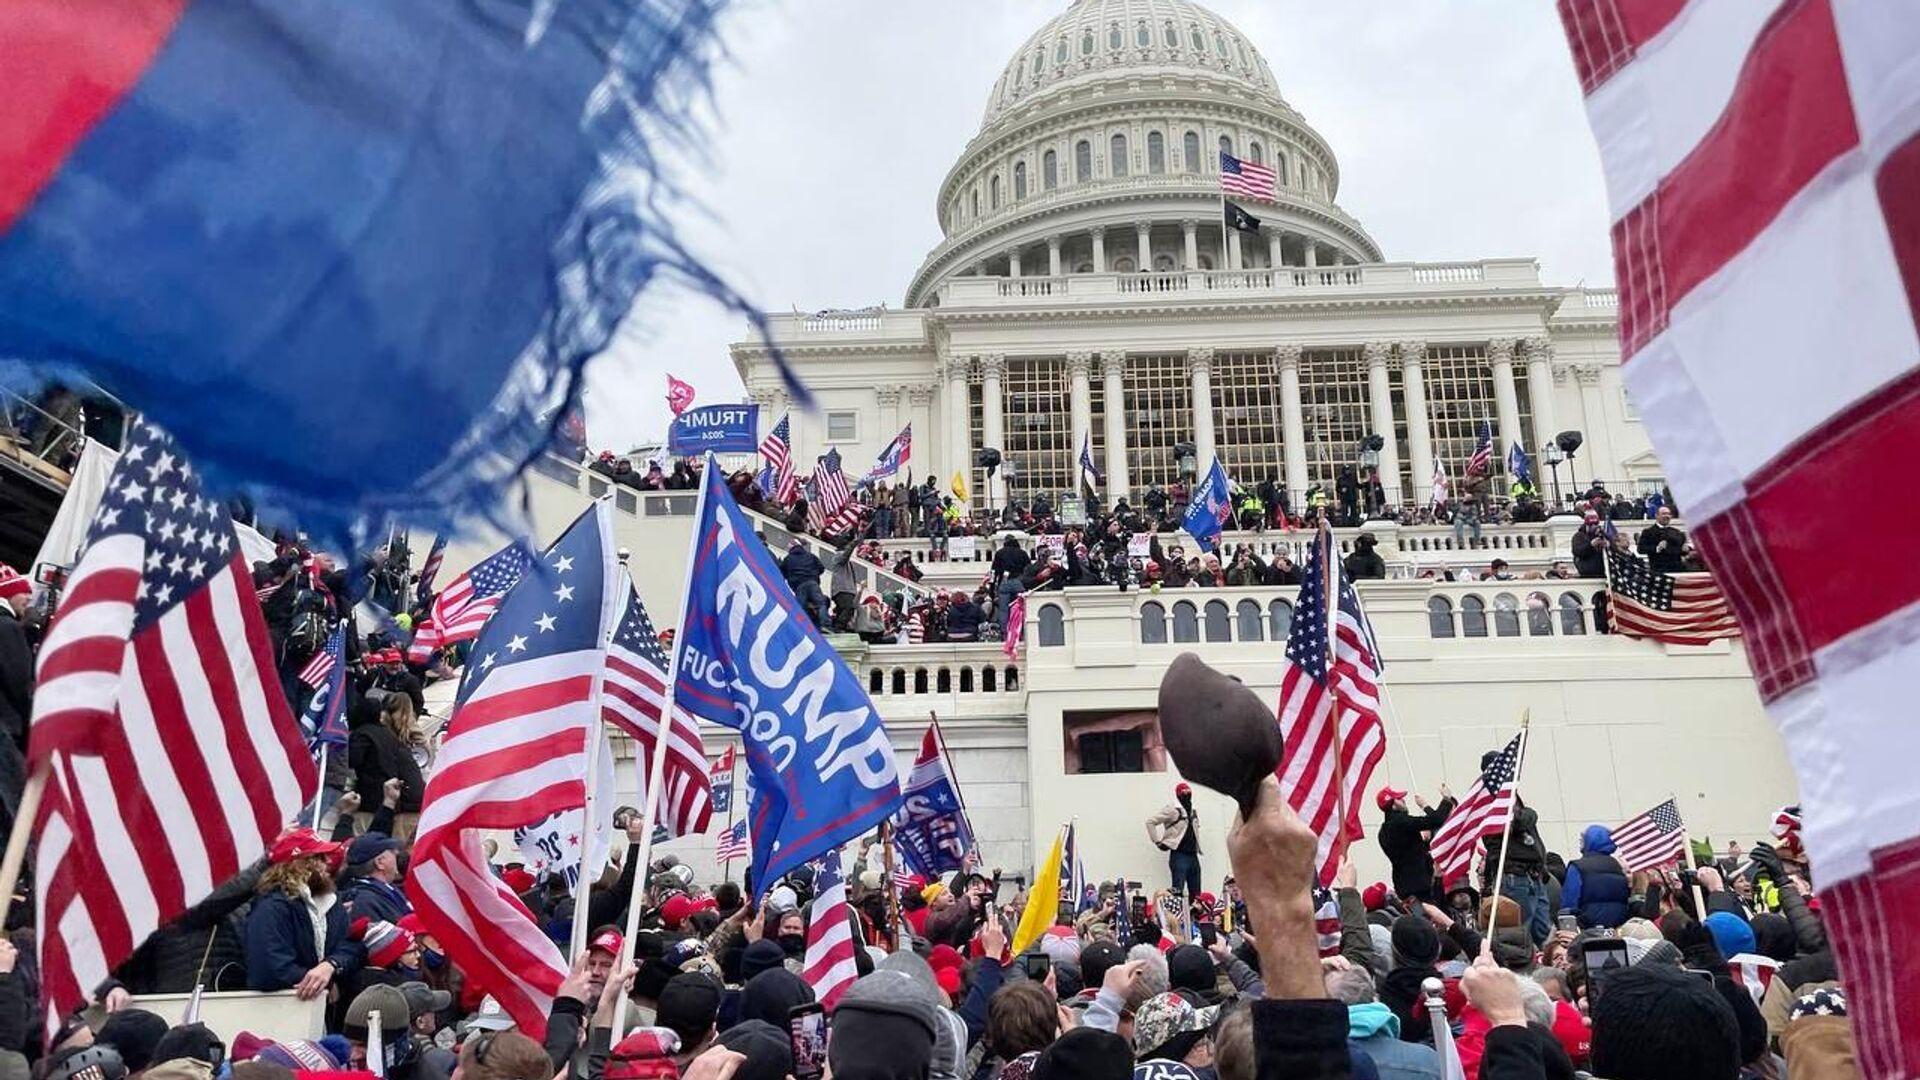 Anhänger von Donald Trump am US-Kapitol, Washington, der 6. Januar 2021 - SNA, 1920, 07.01.2021